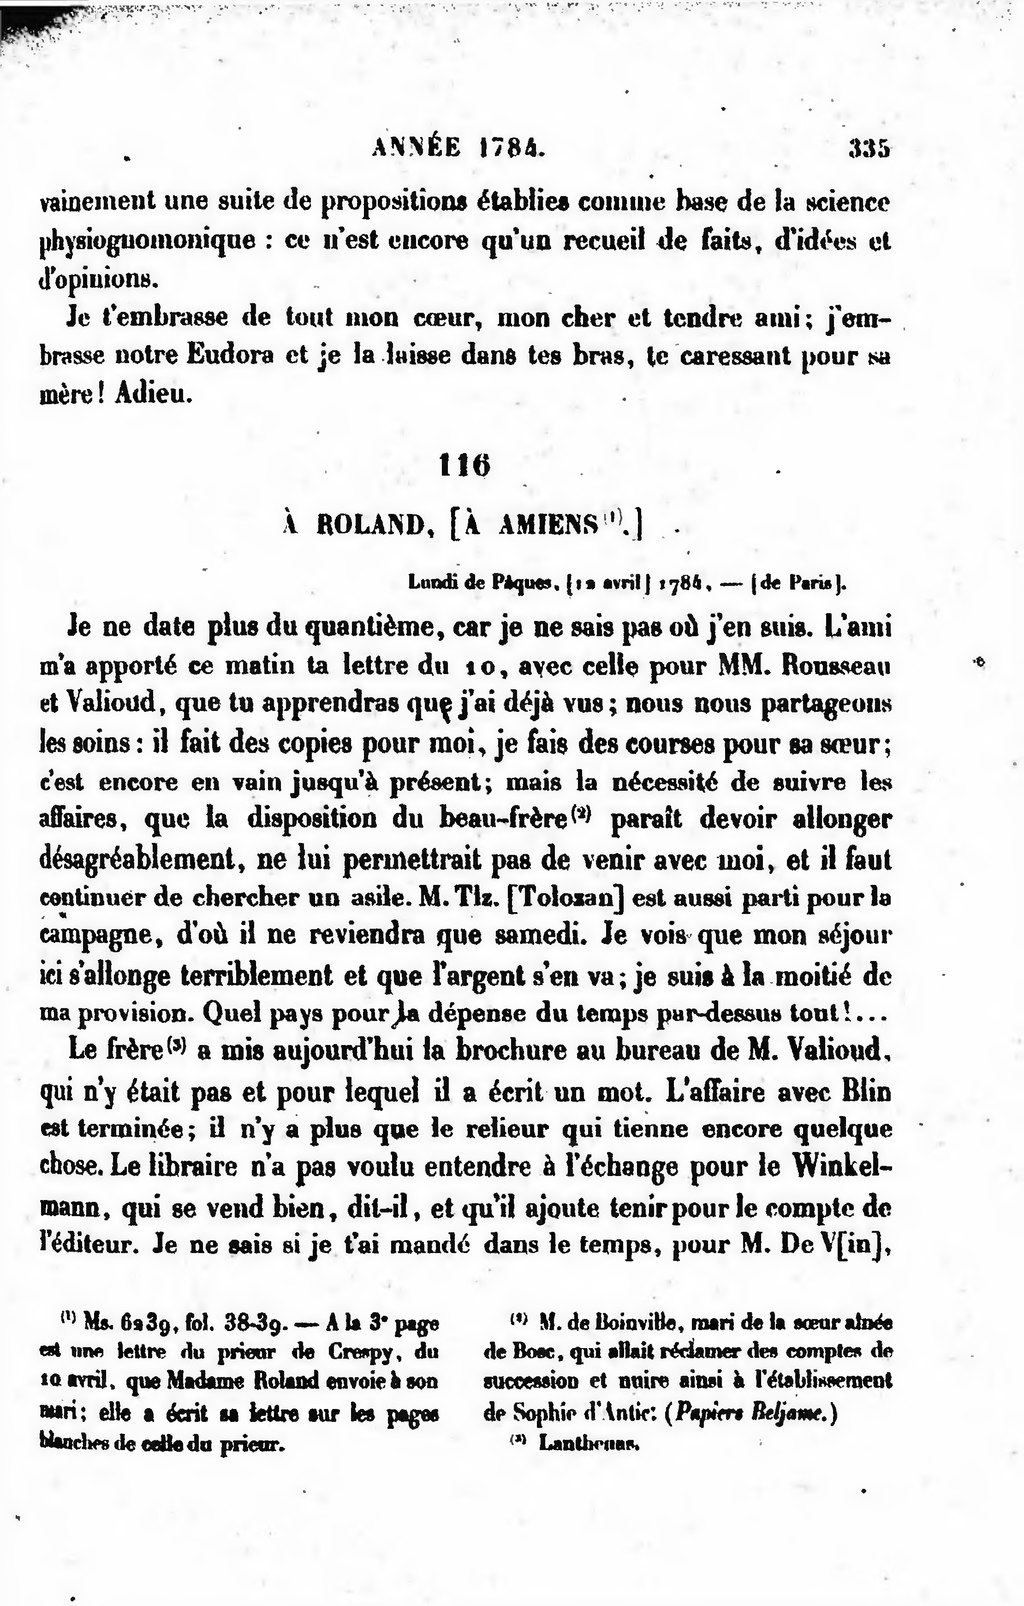 Pageroland Manon Lettres 1780 1793djvu429 Wikisource